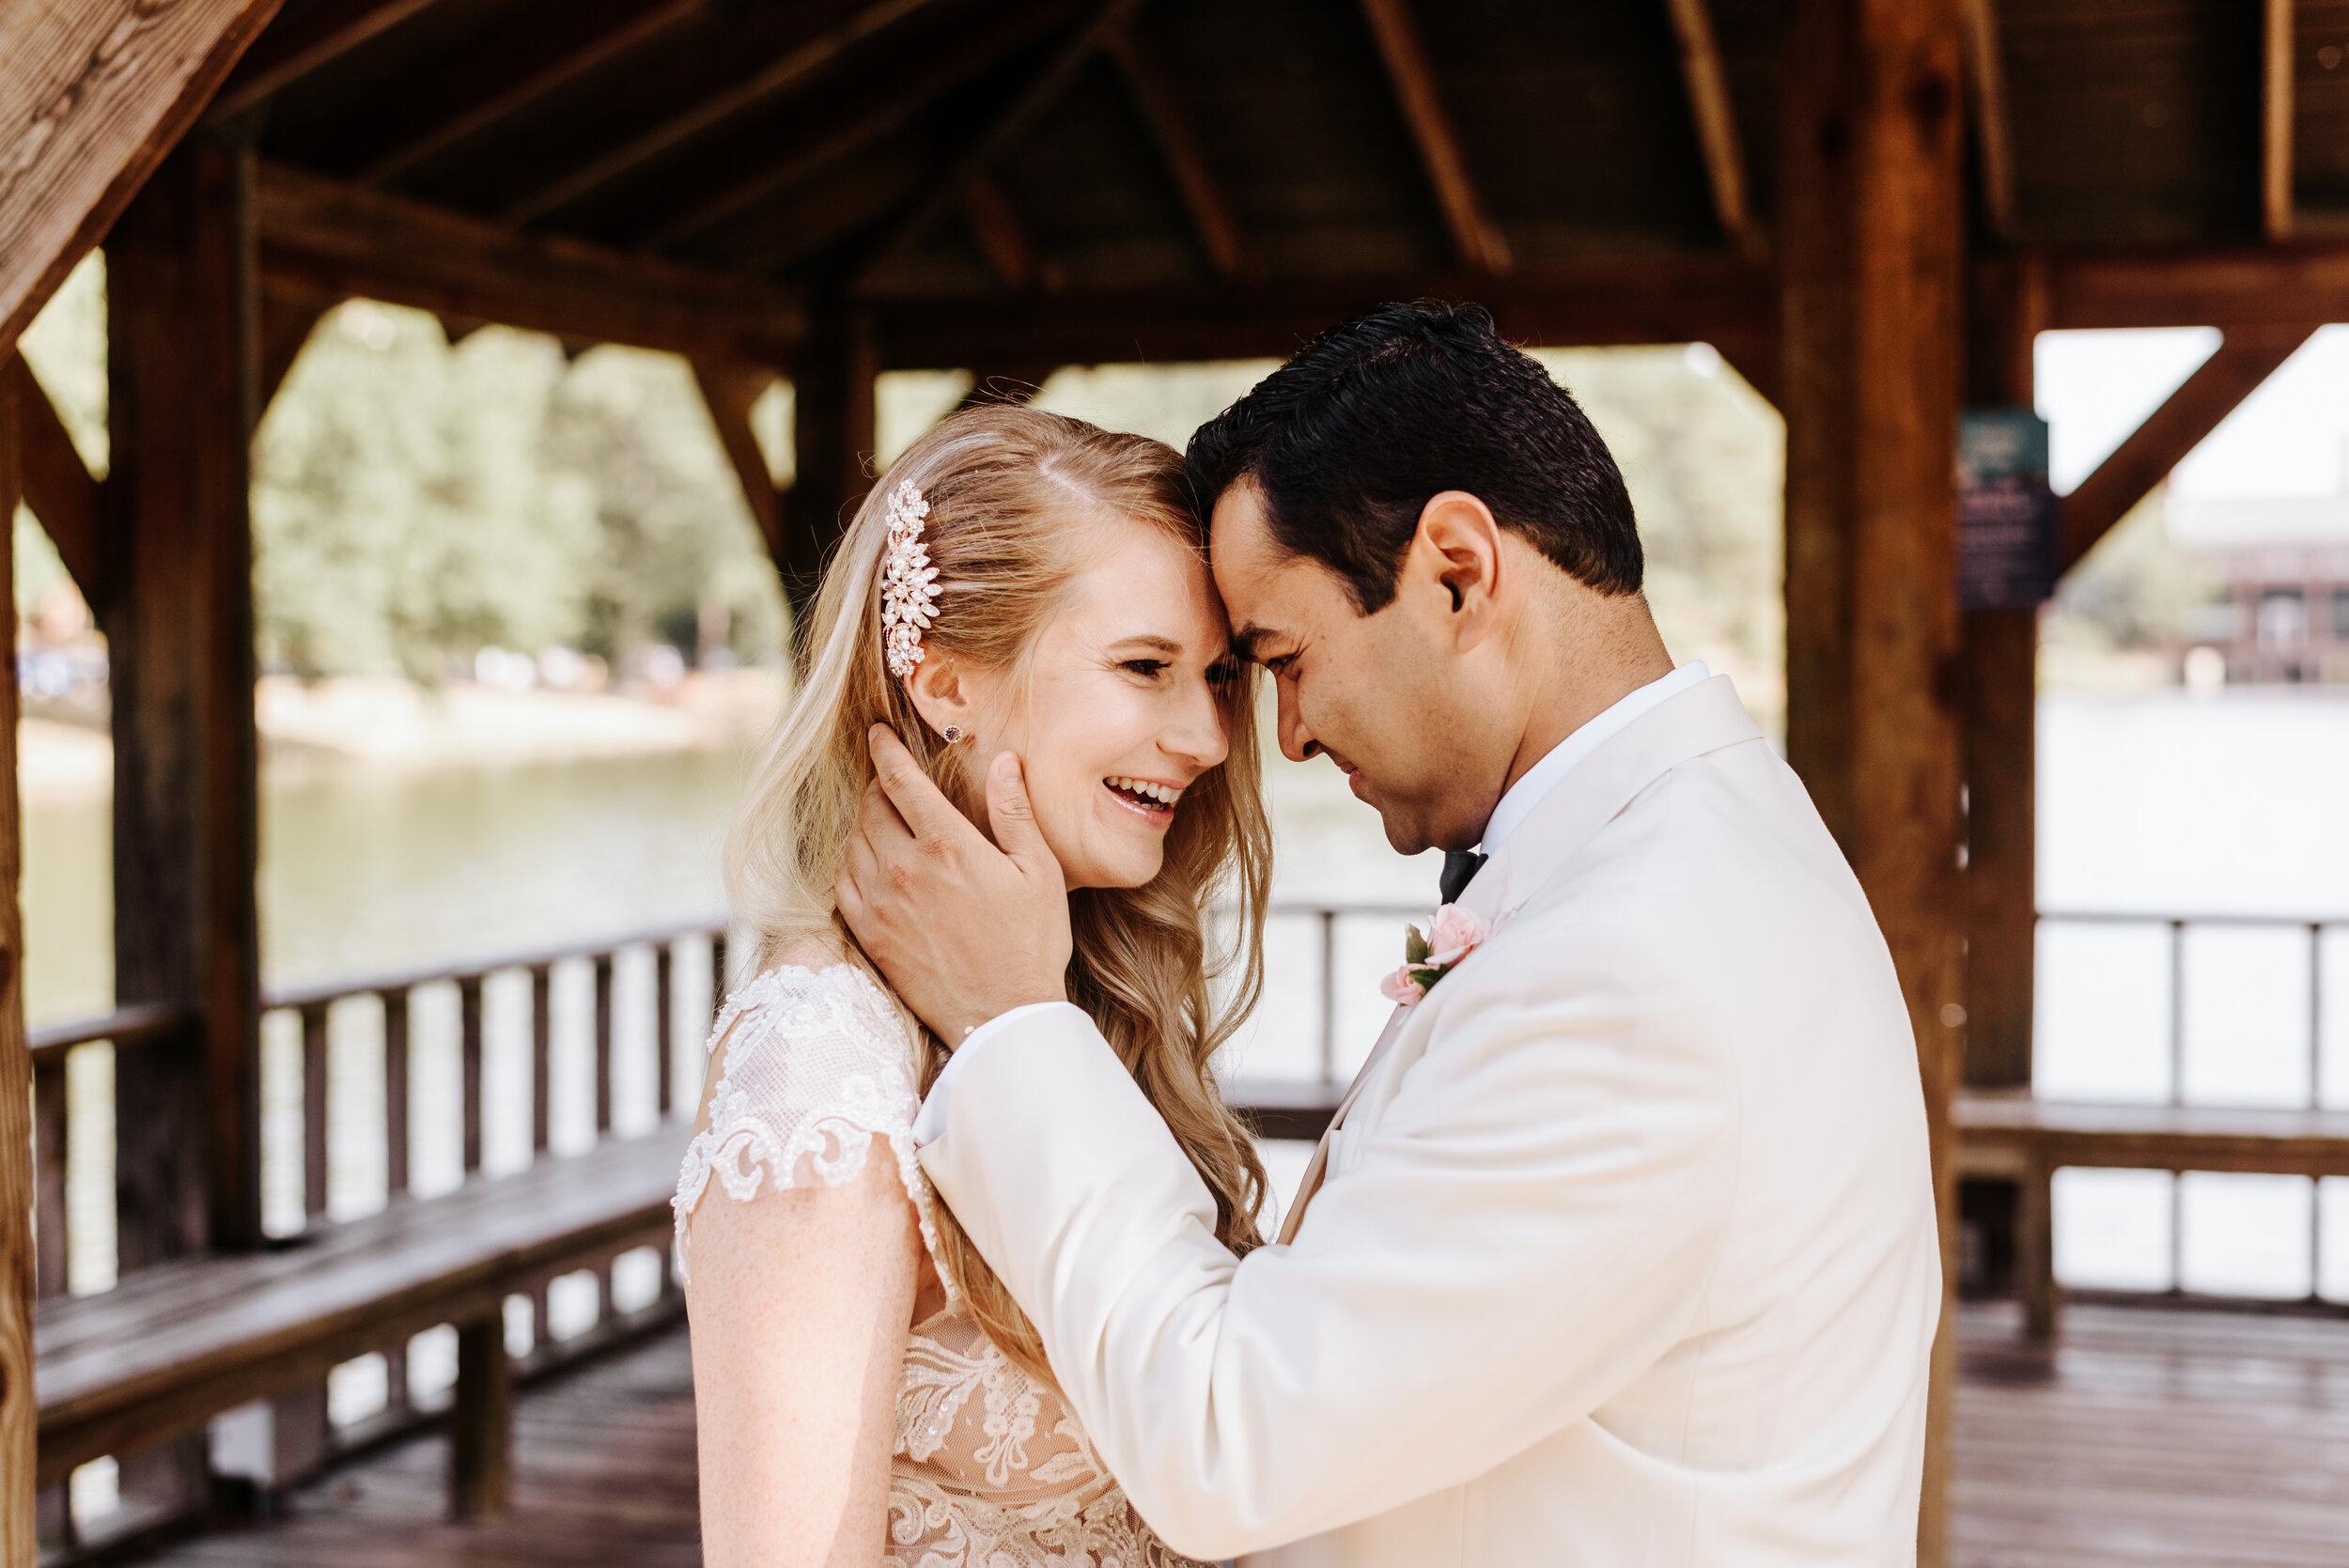 Cassie-Mrunal-Wedding-Quirk-Hotel-John-Marshall-Ballrooms-Richmond-Virginia-Photography-by-V-47.jpg